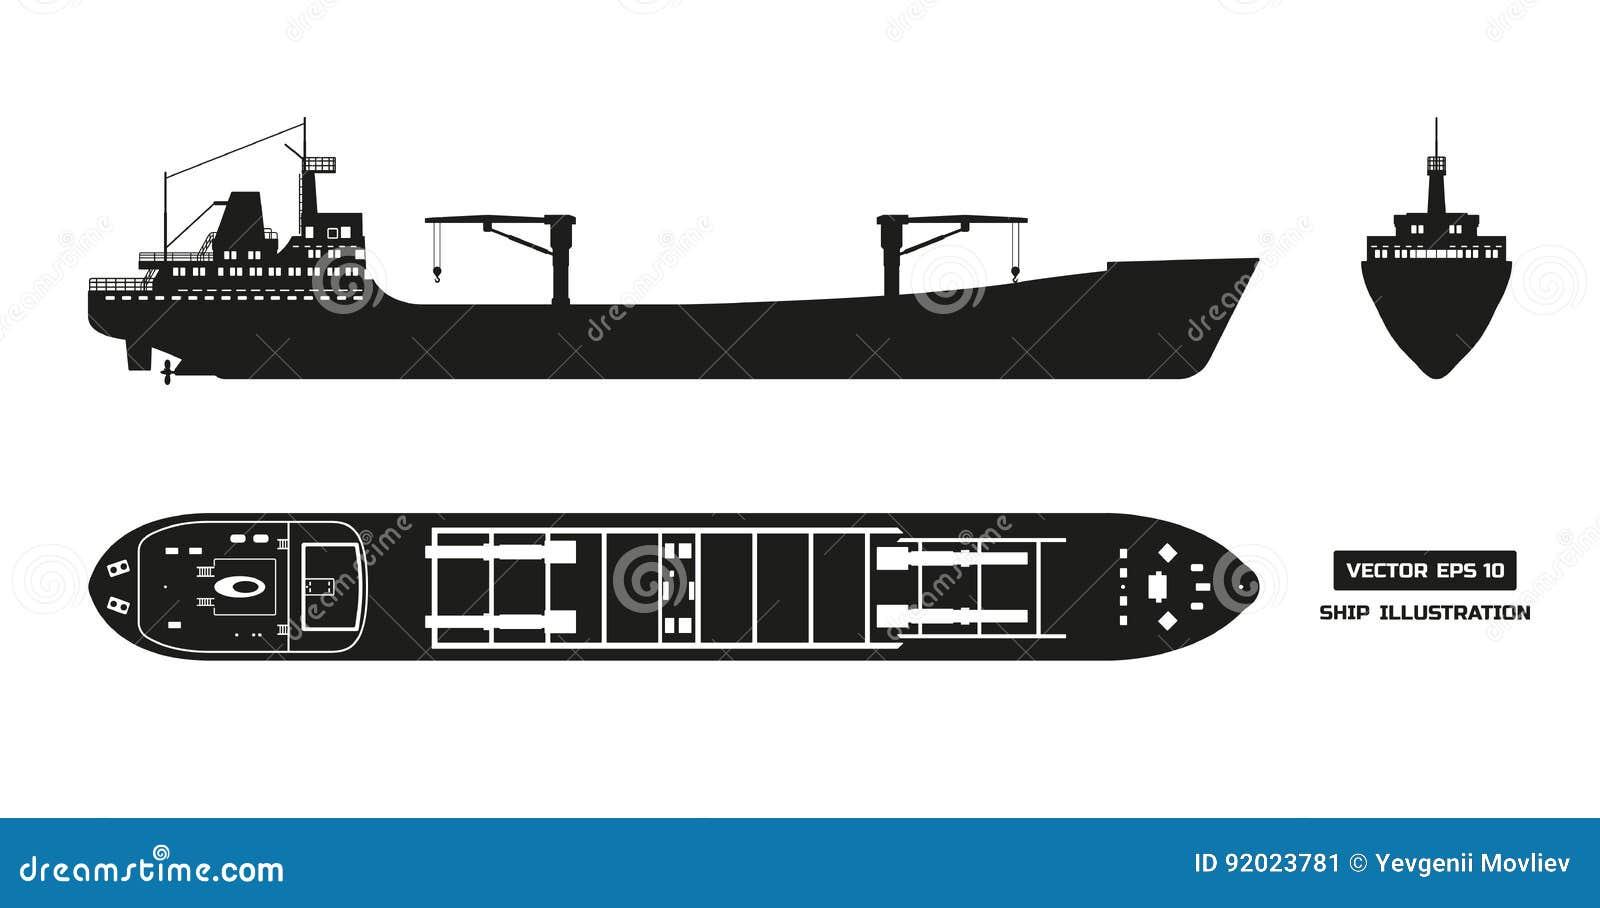 Cargo Ship Clipart Danasohmk Top: Silhouette Of Cargo Ship On A White Background. Top, Side